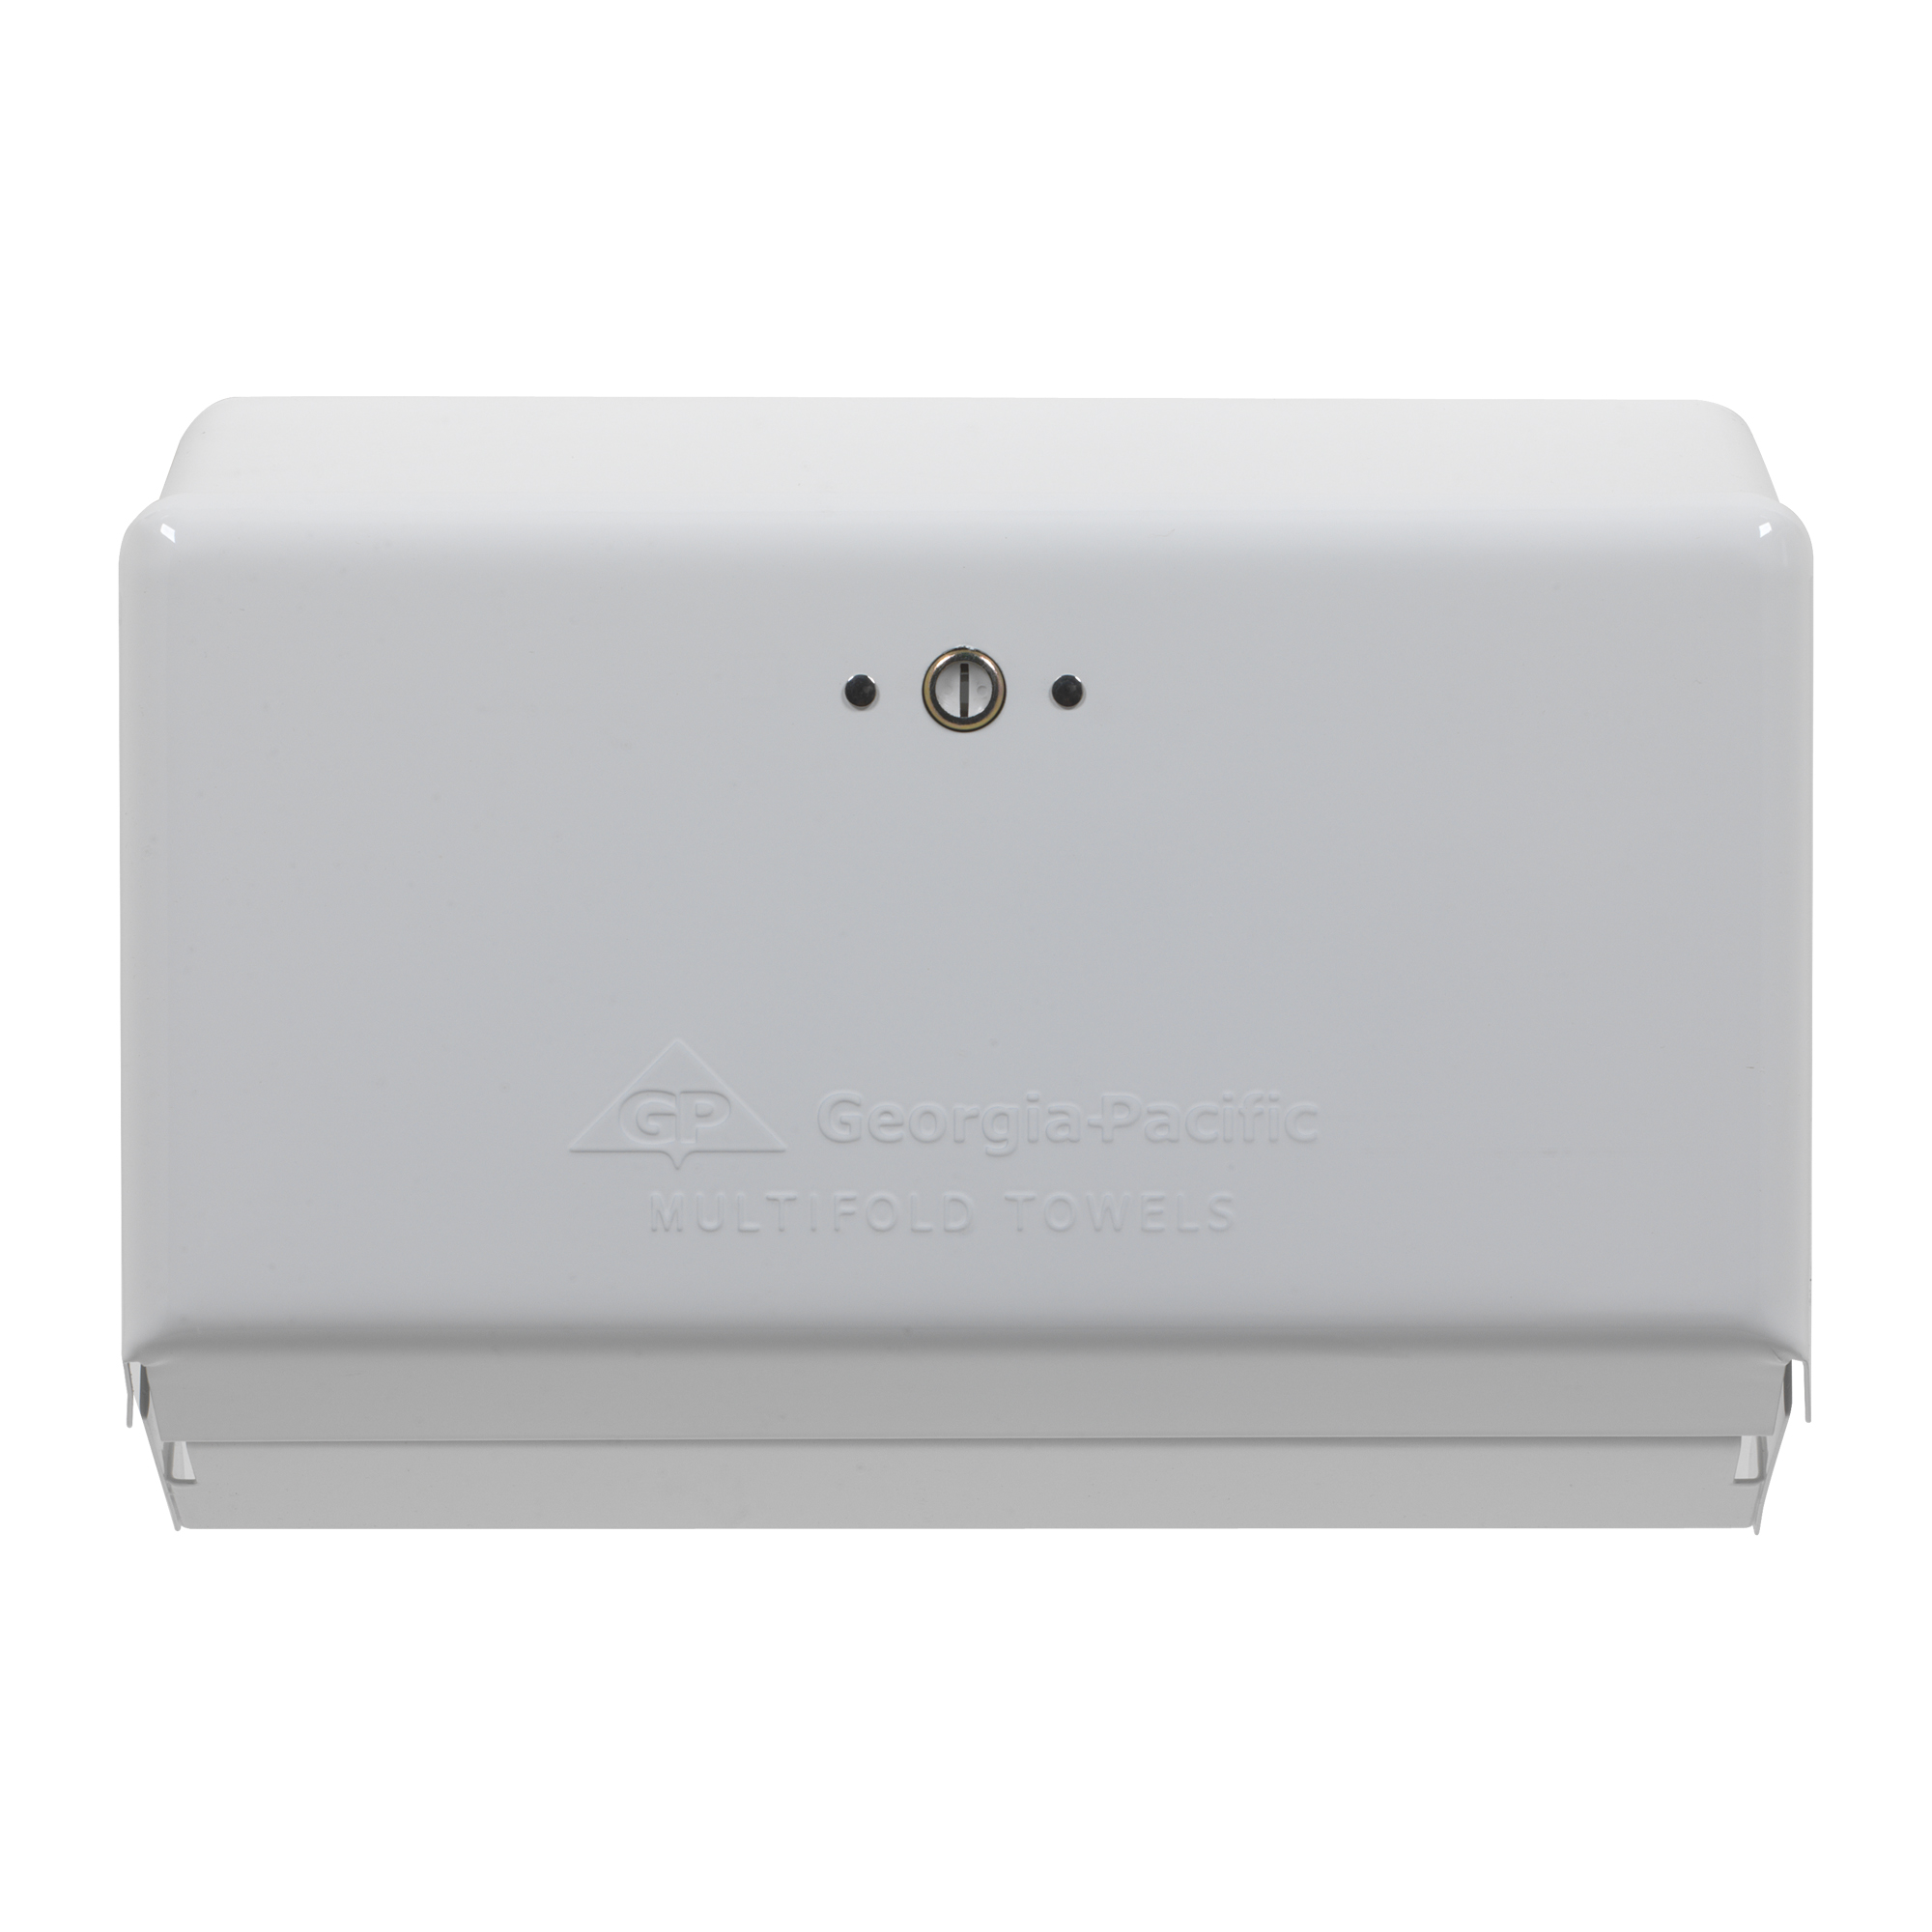 10073310547012 GP White Multifold Towel Dispenser